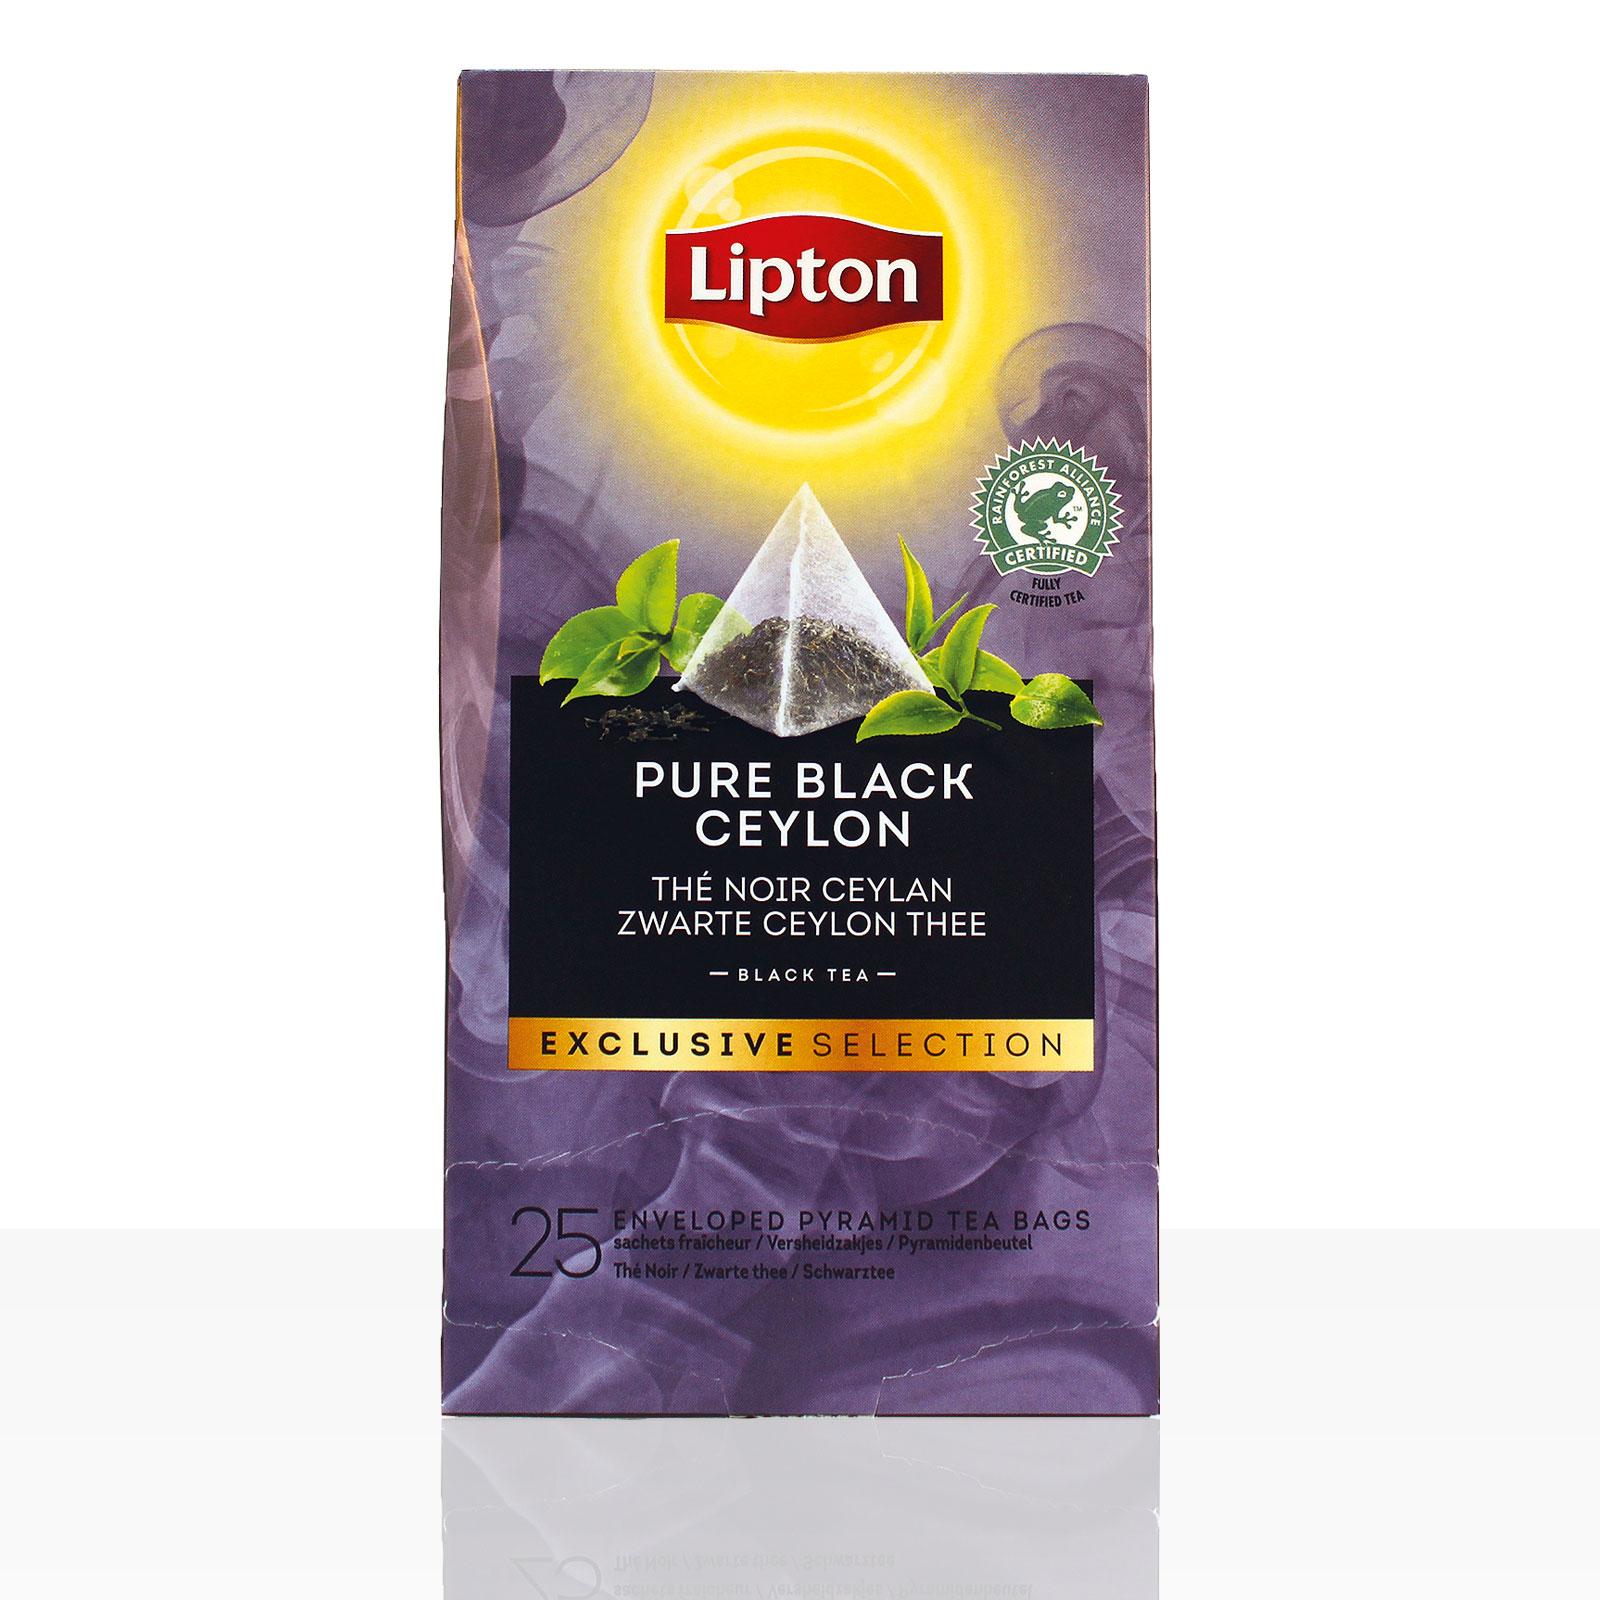 Lipton Tee Exclusive Selection Pure Black Ceylon 6 x 25 Beutel á 0,9g